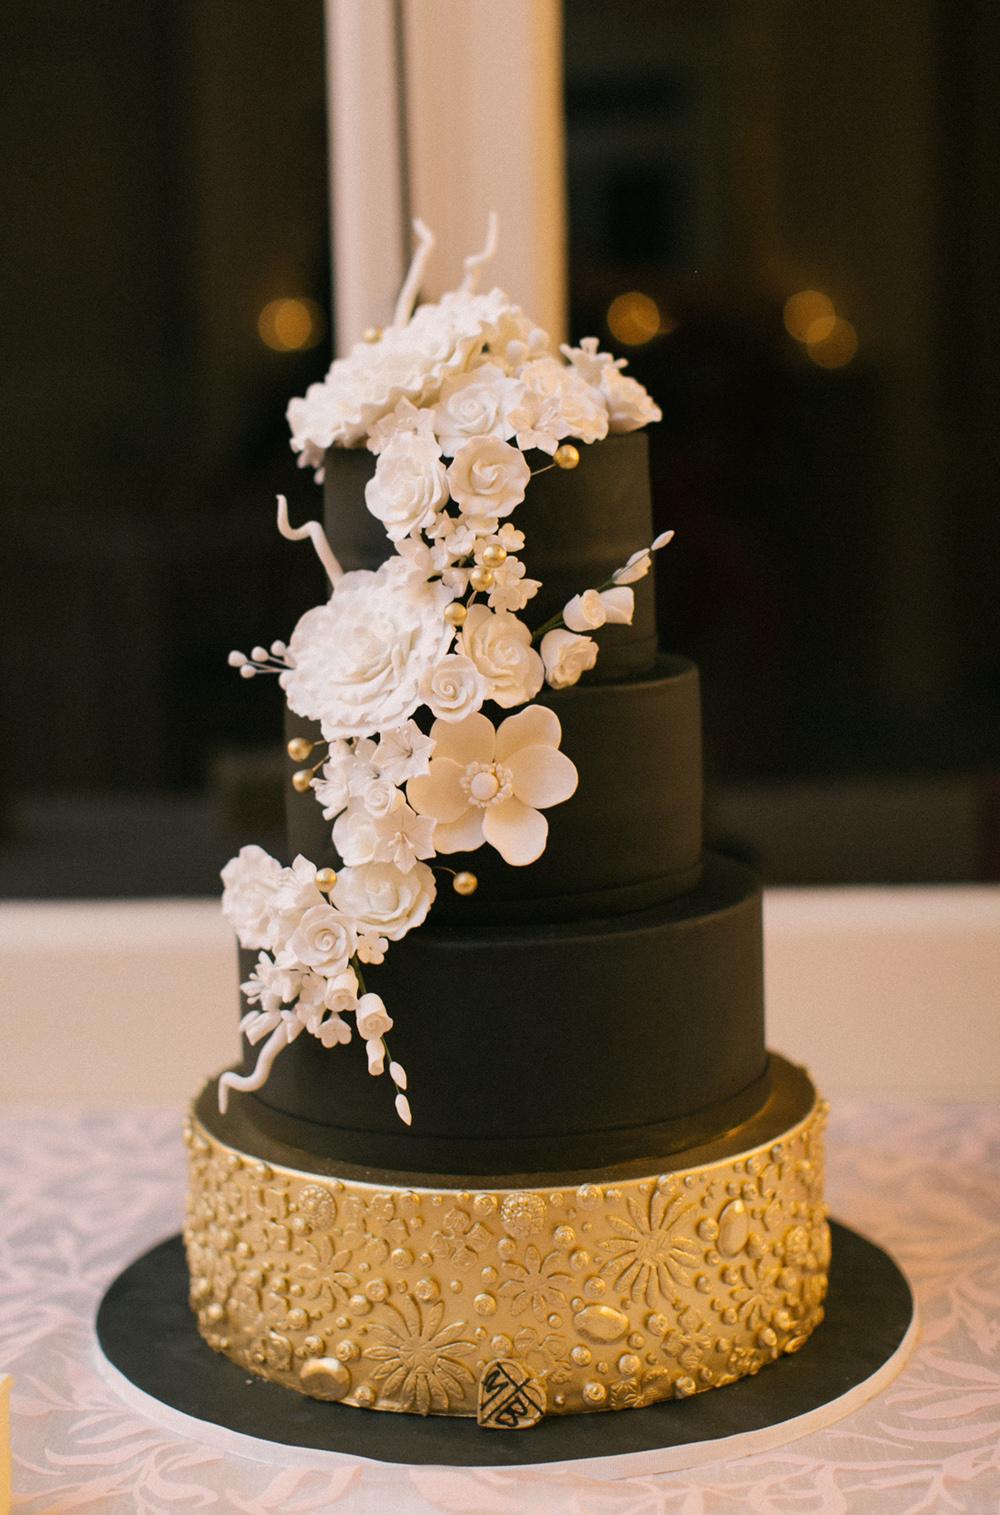 Thomas Joseph Cake Decorating